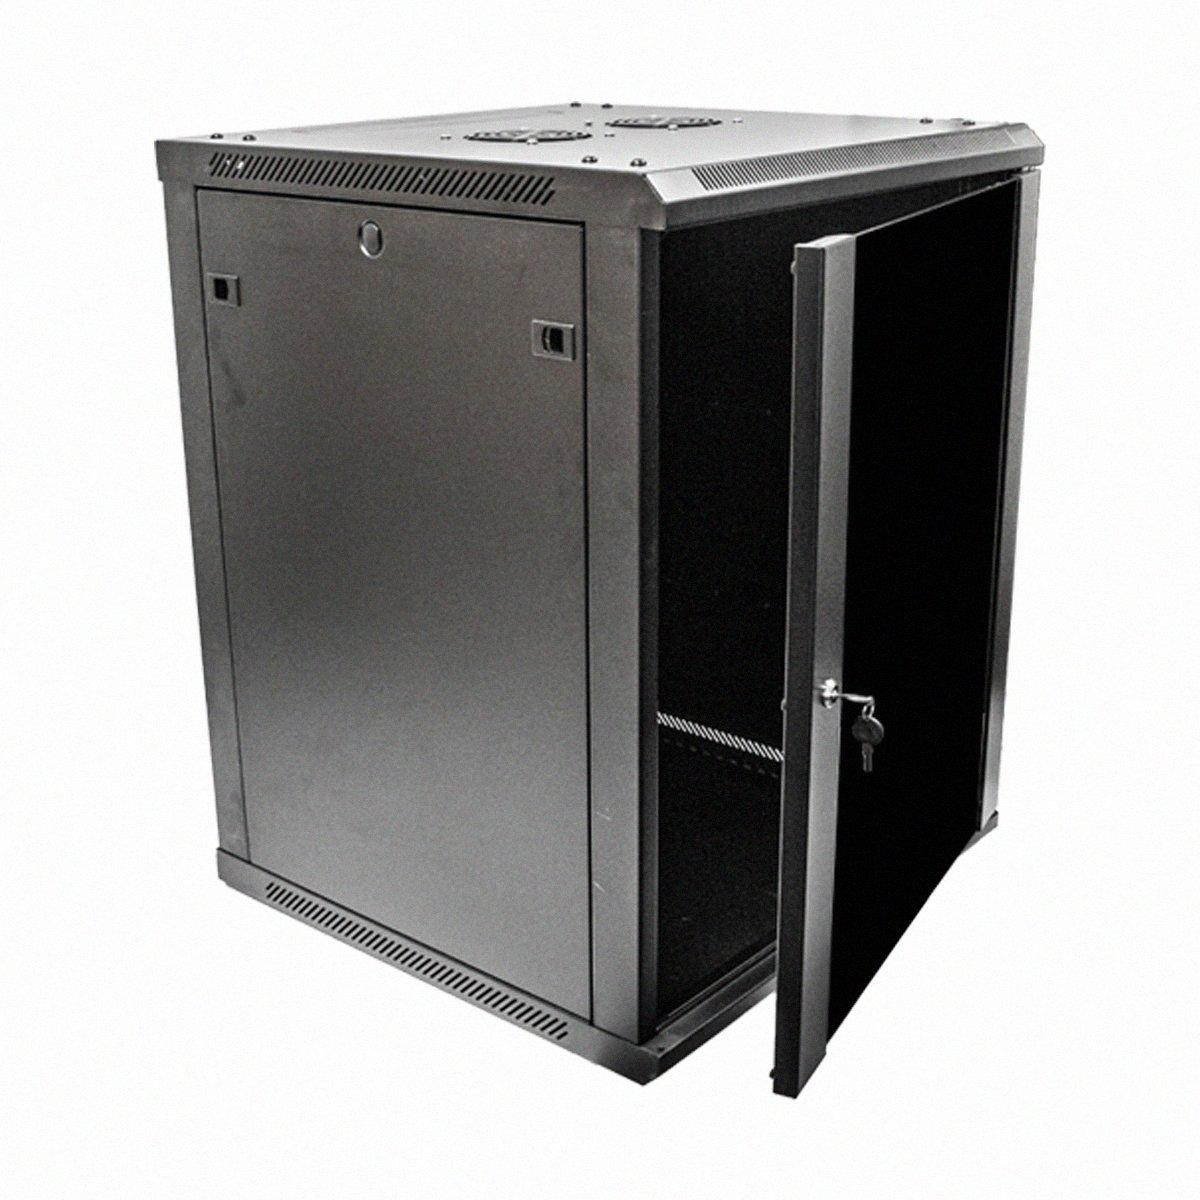 Navepoint 15U Deluxe IT Wallmount Cabinet Enclosure 19-Inch Server Network Rack With Locking Glass Door 24-Inches Deep Black